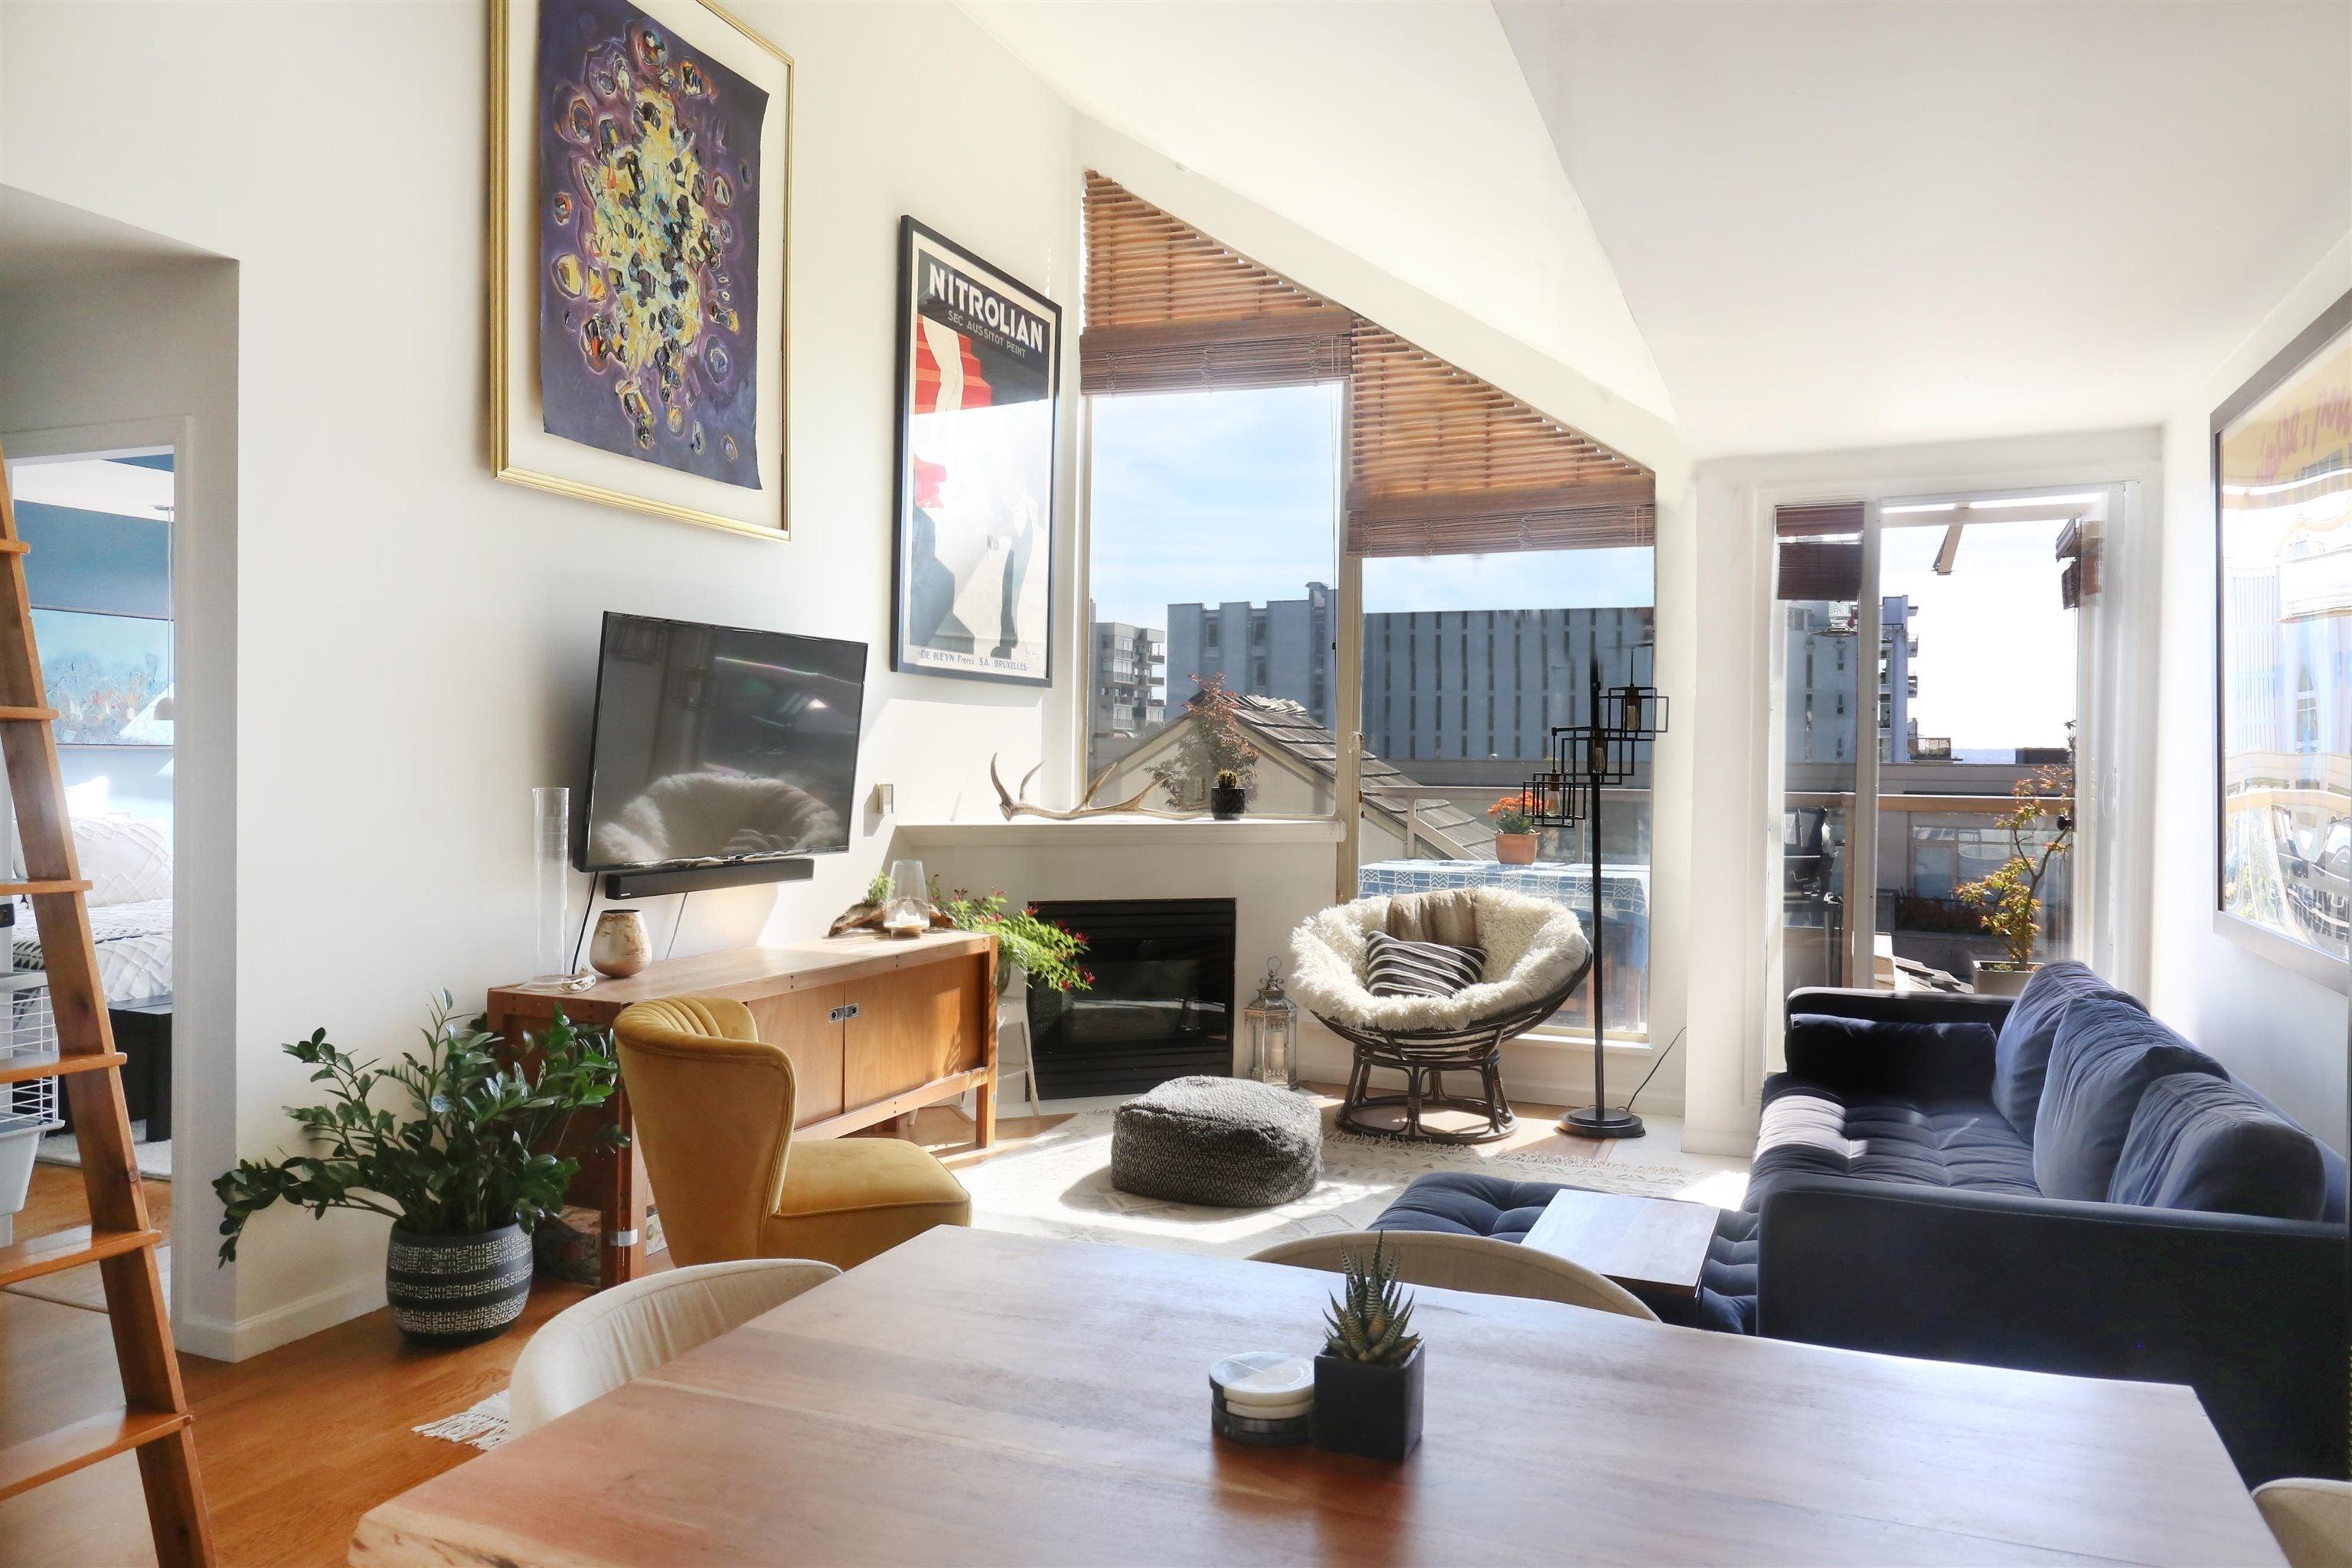 202 1871 MARINE DRIVE - Ambleside Apartment/Condo for sale, 2 Bedrooms (R2618796)